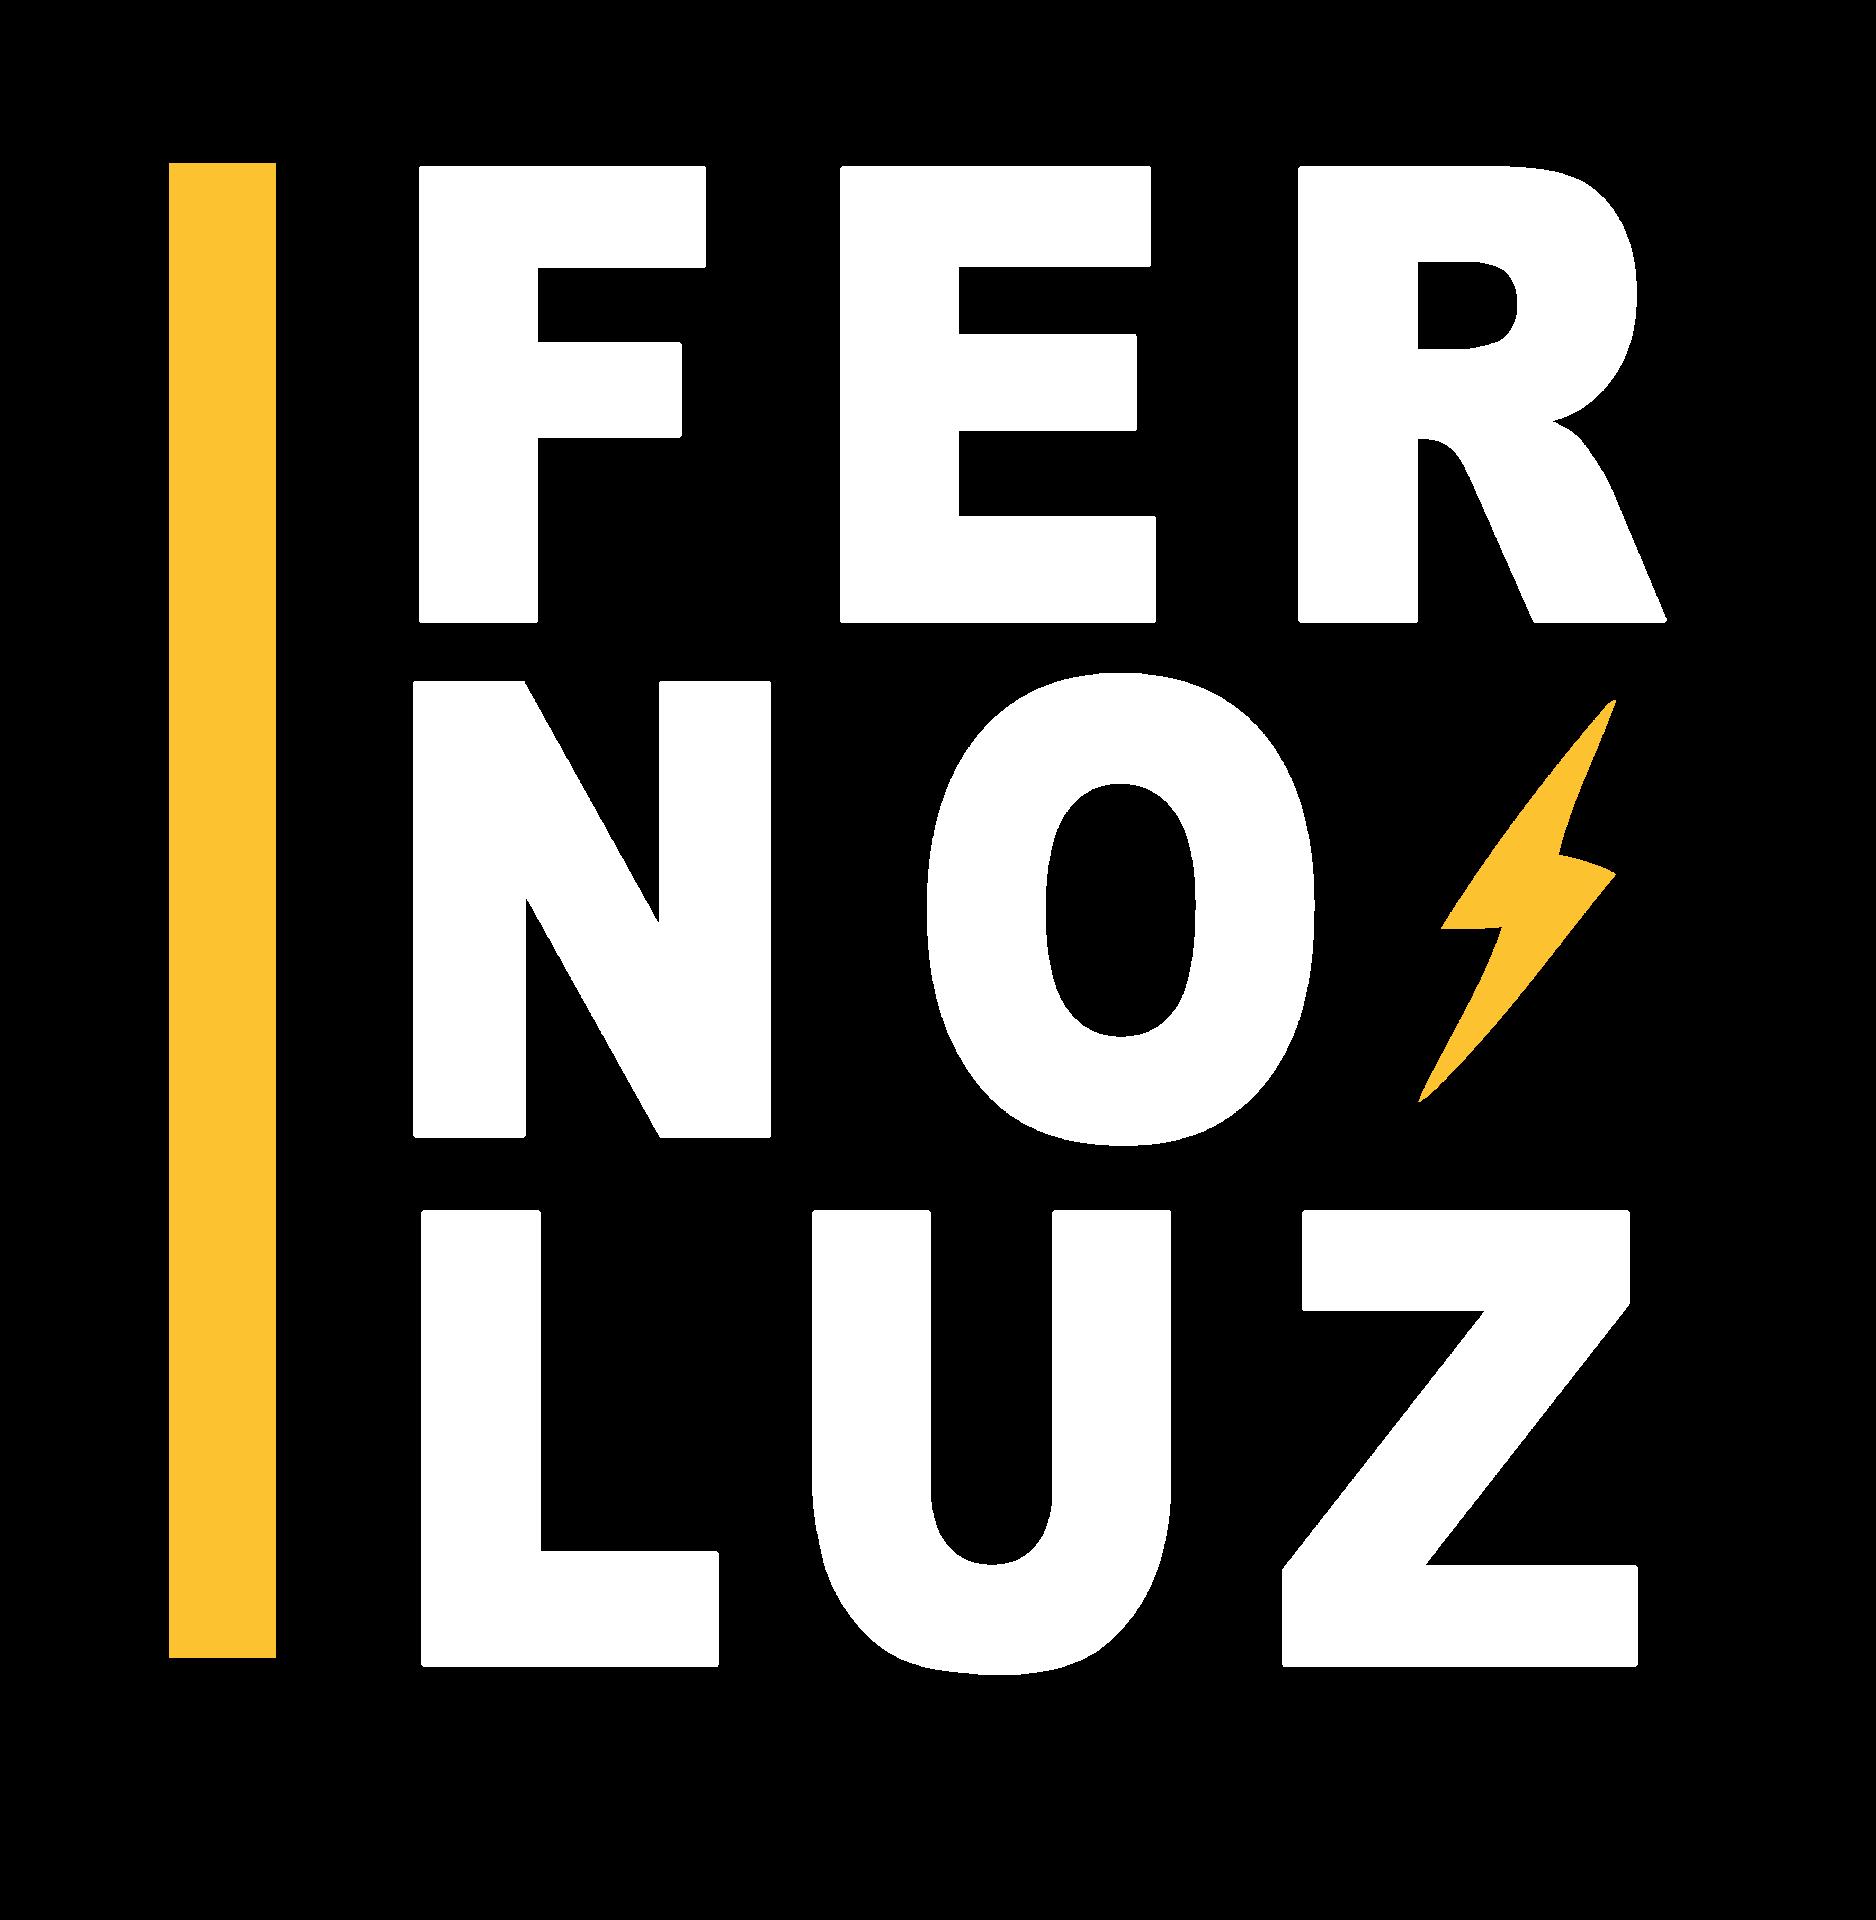 FERRETERIA FERNOLUZ